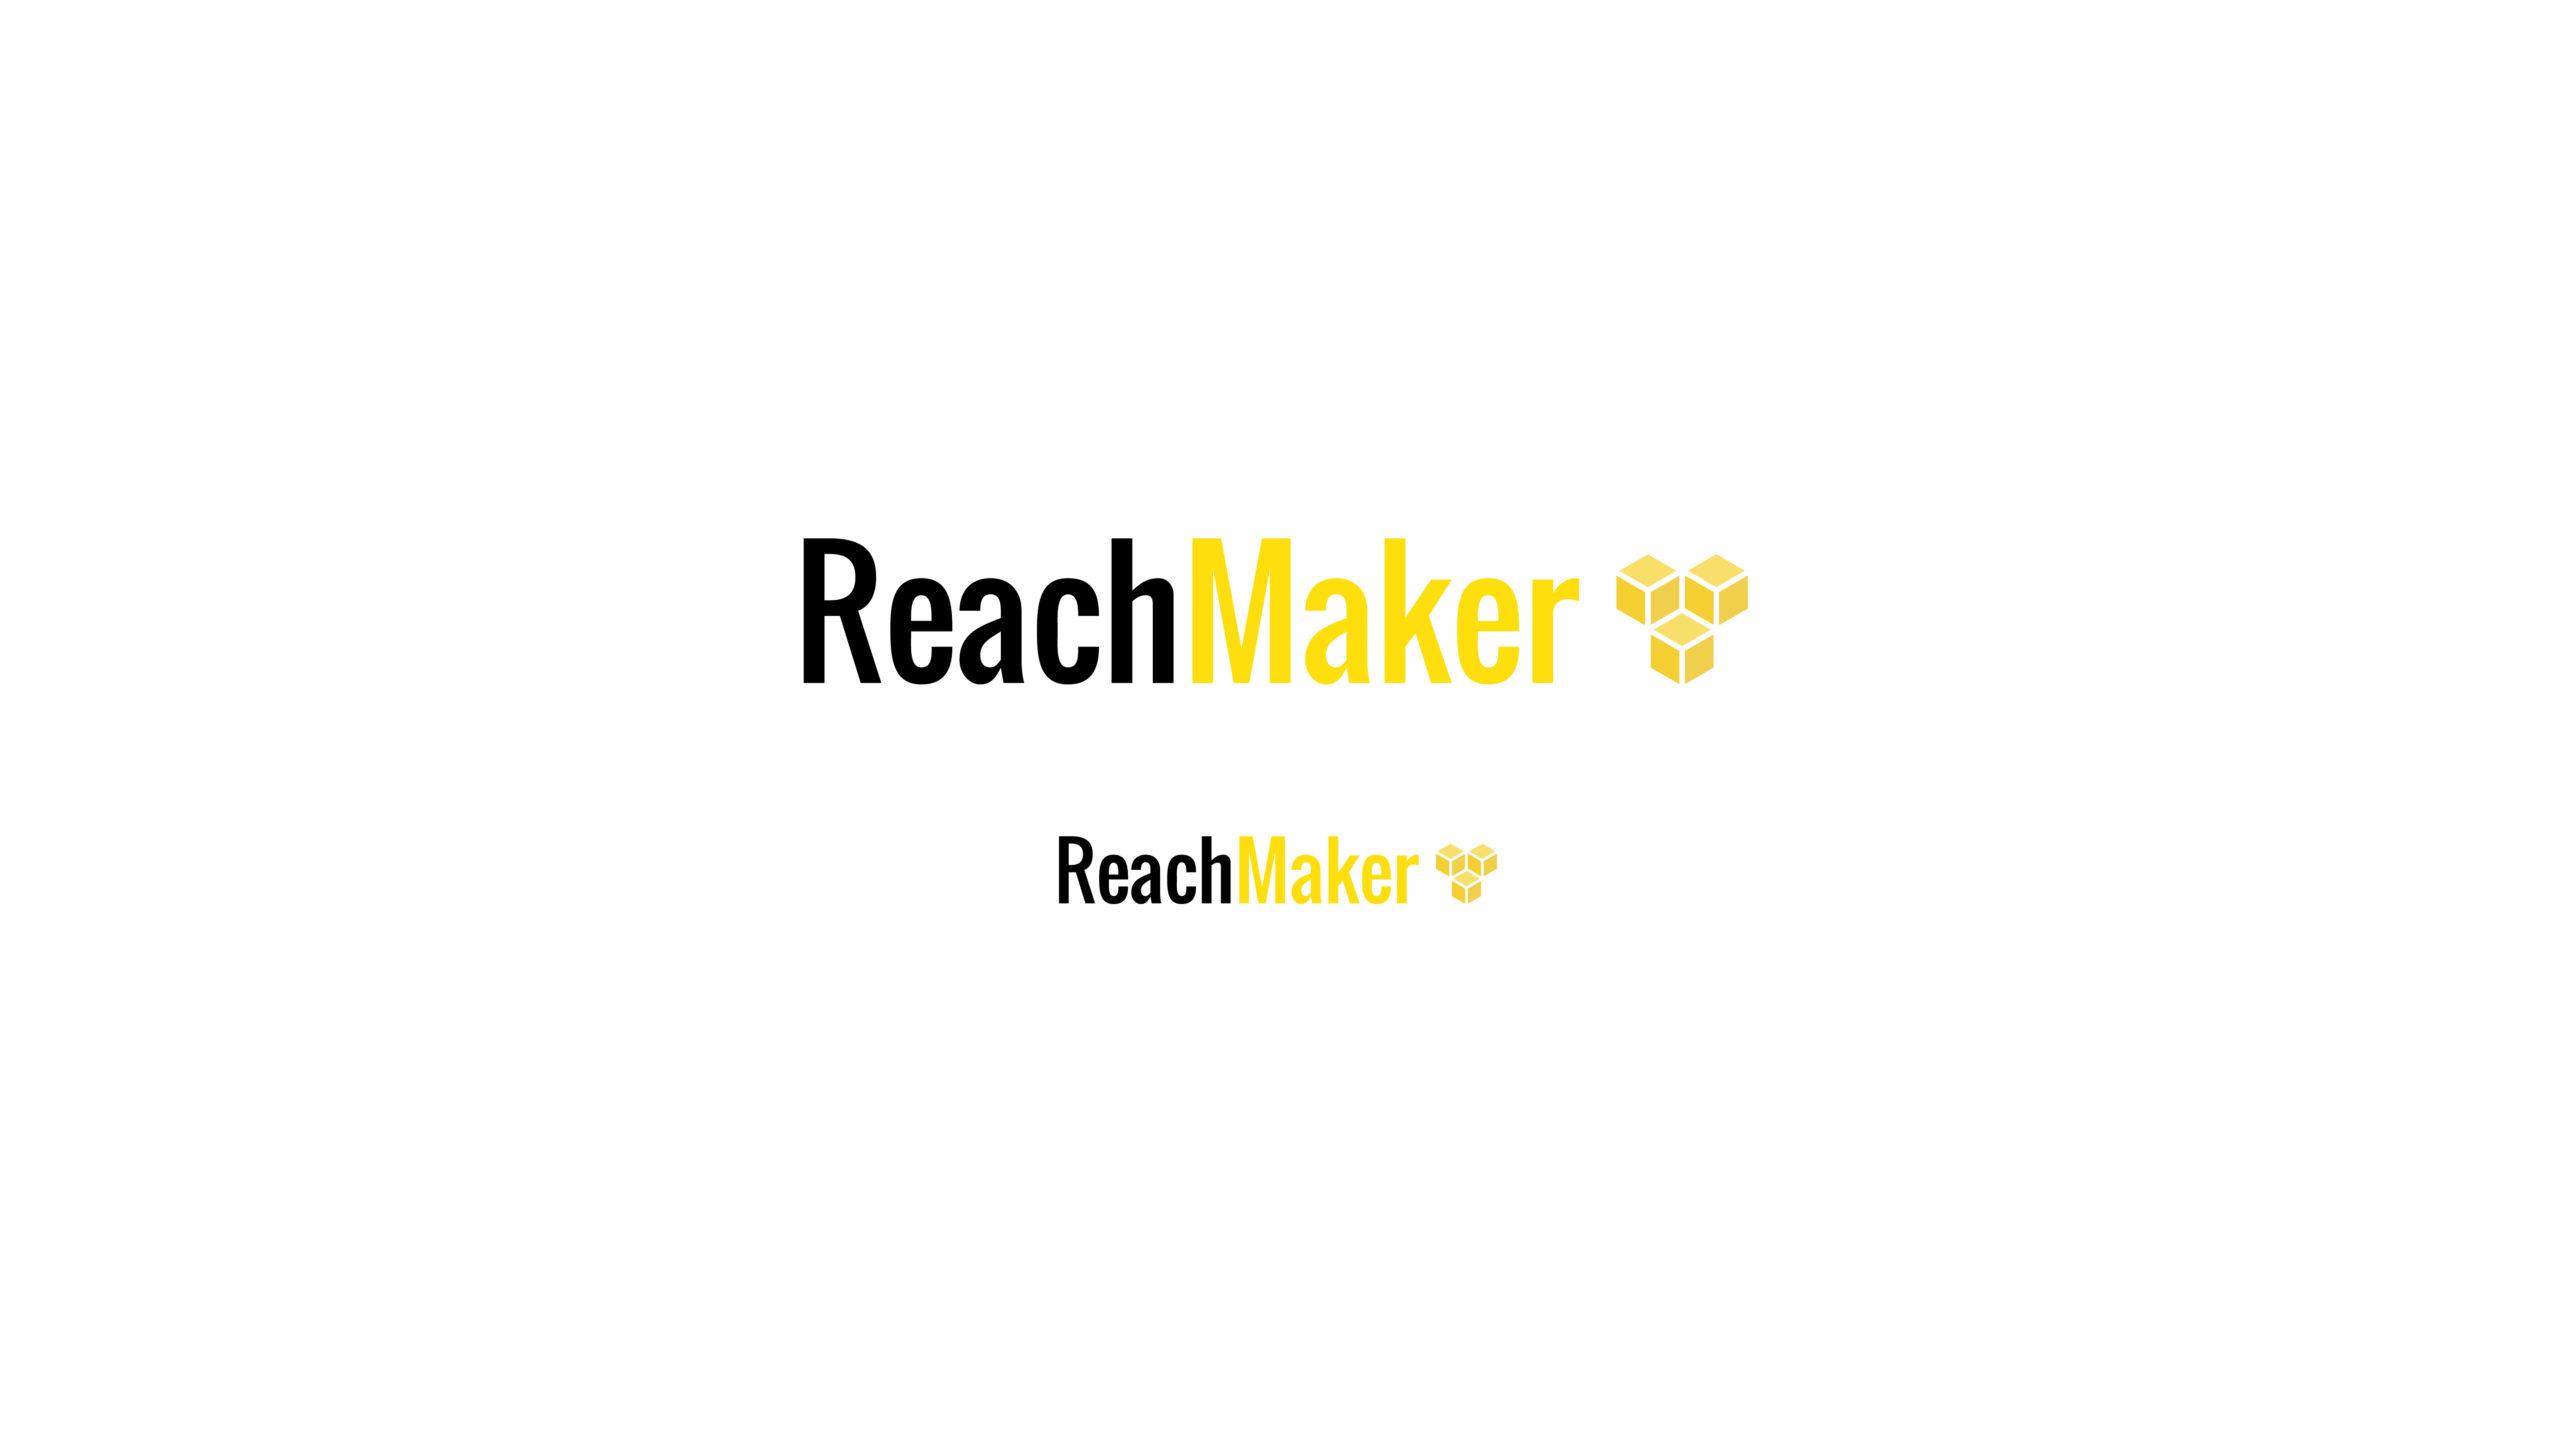 Mise_en_page_ReachMaker 1